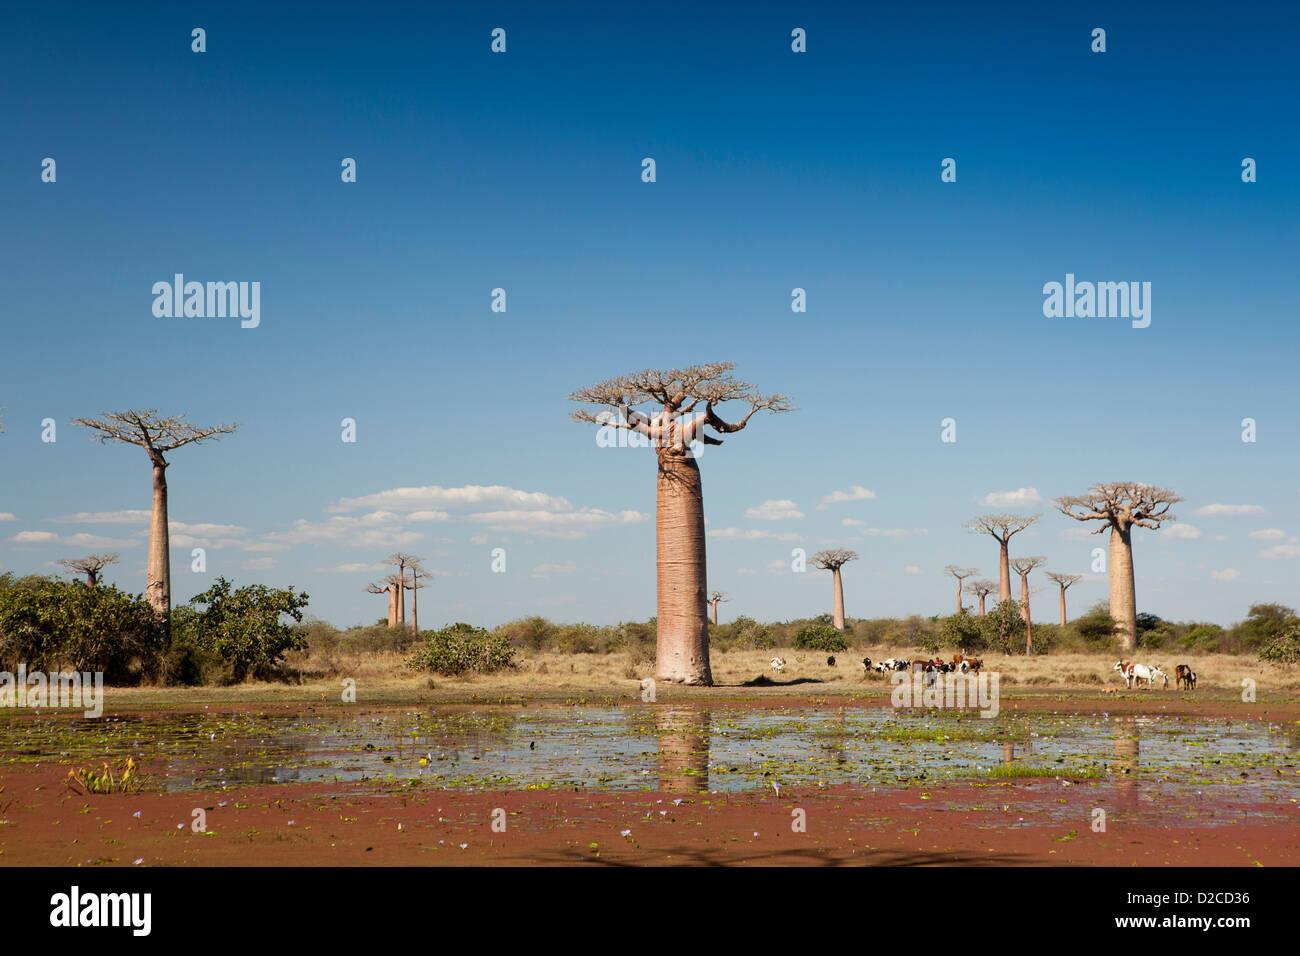 Madagascar, Morondava, Avenue of baobabs, boy grazing cattle at pond below Baobab trees Stock Photo